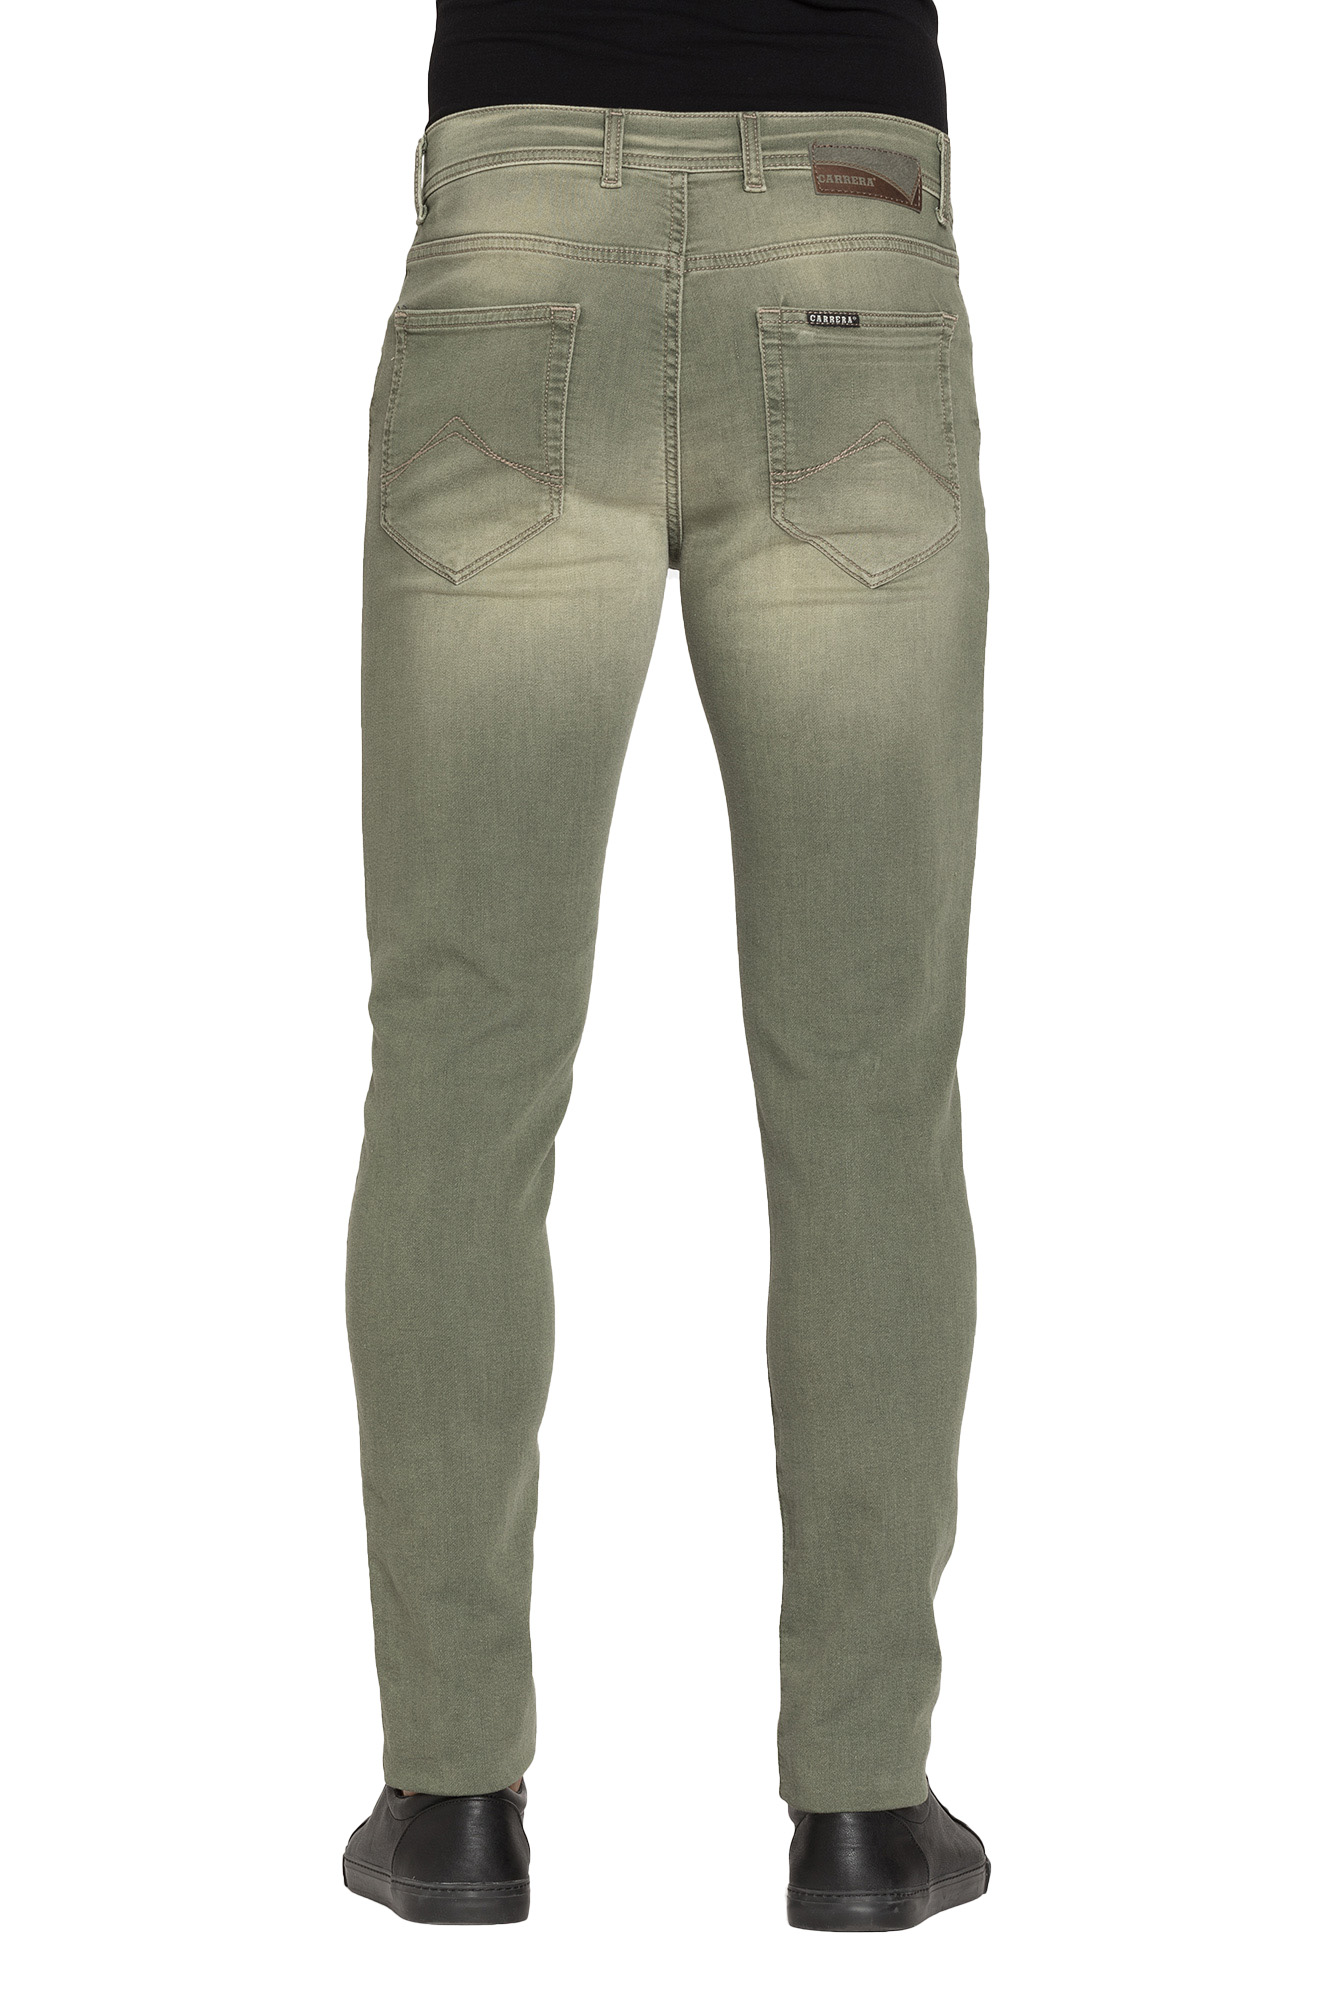 Carrera-Jeans-Jeans-per-uomo-tinta-unita miniatura 13